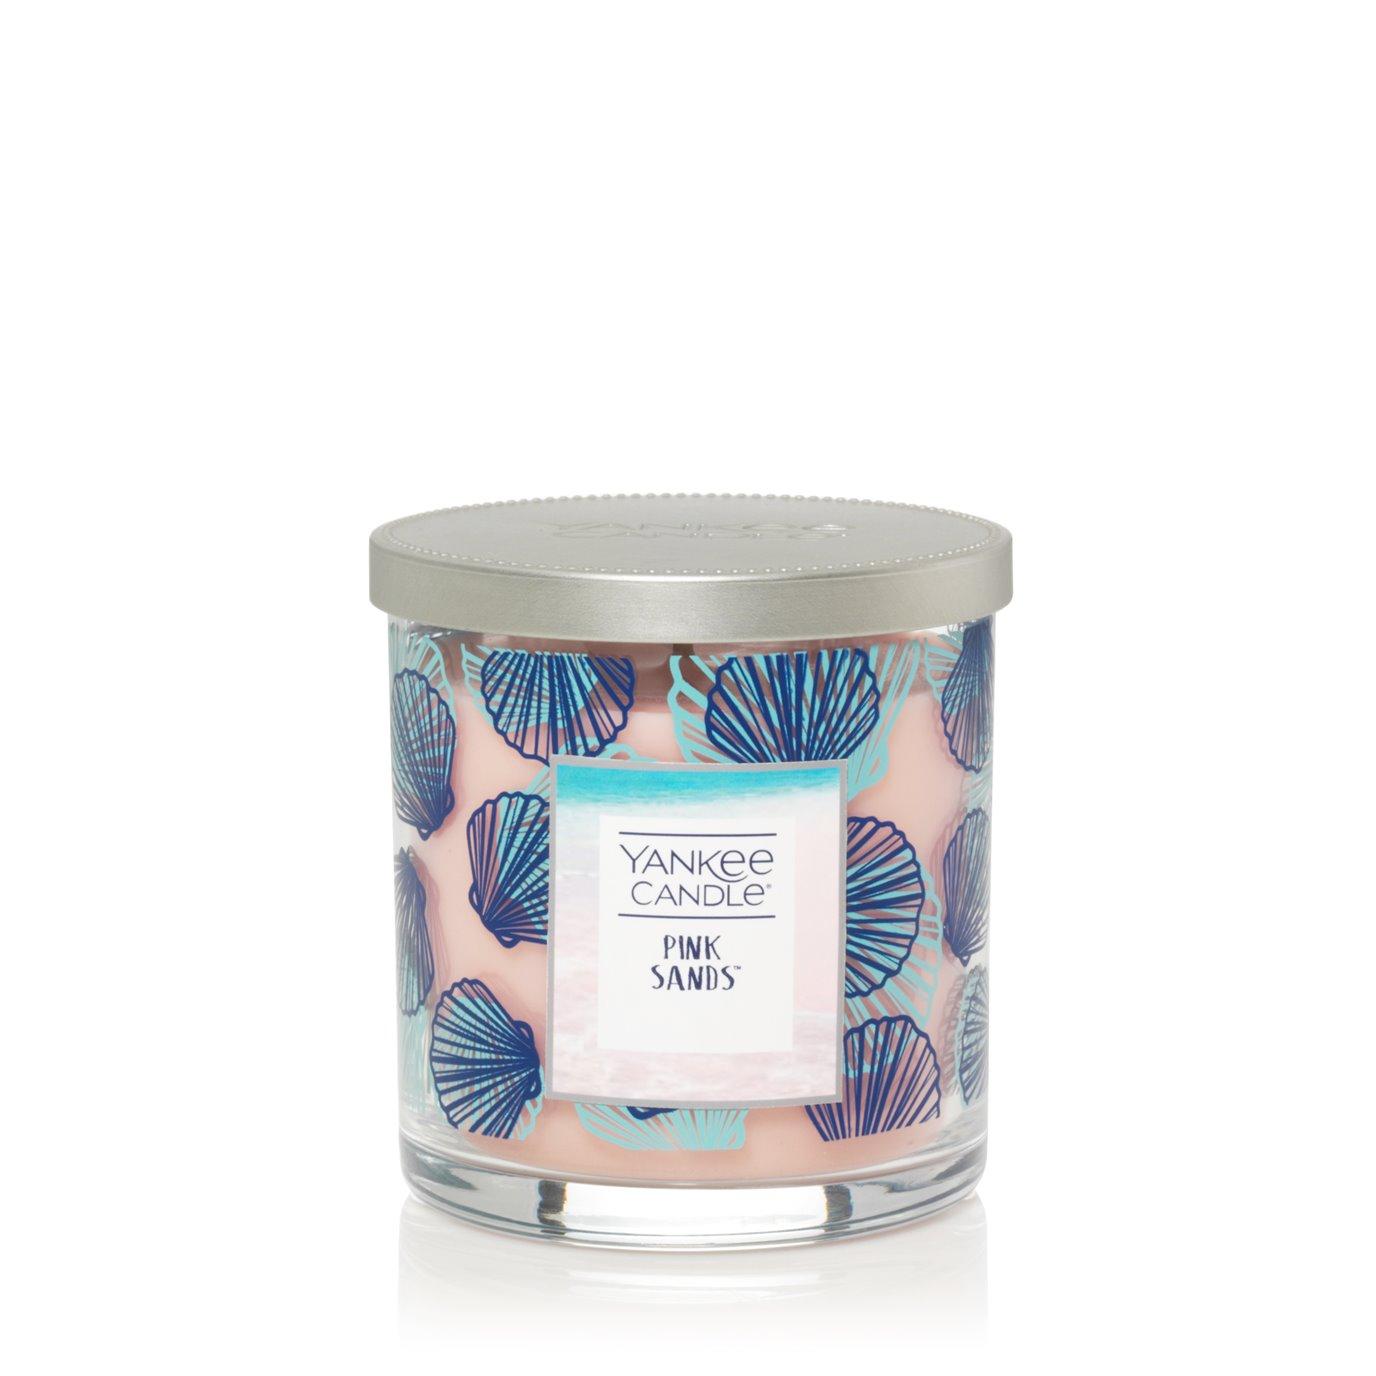 Yankee Candle Pink Sands Regular Tumbler Candle- Seashell